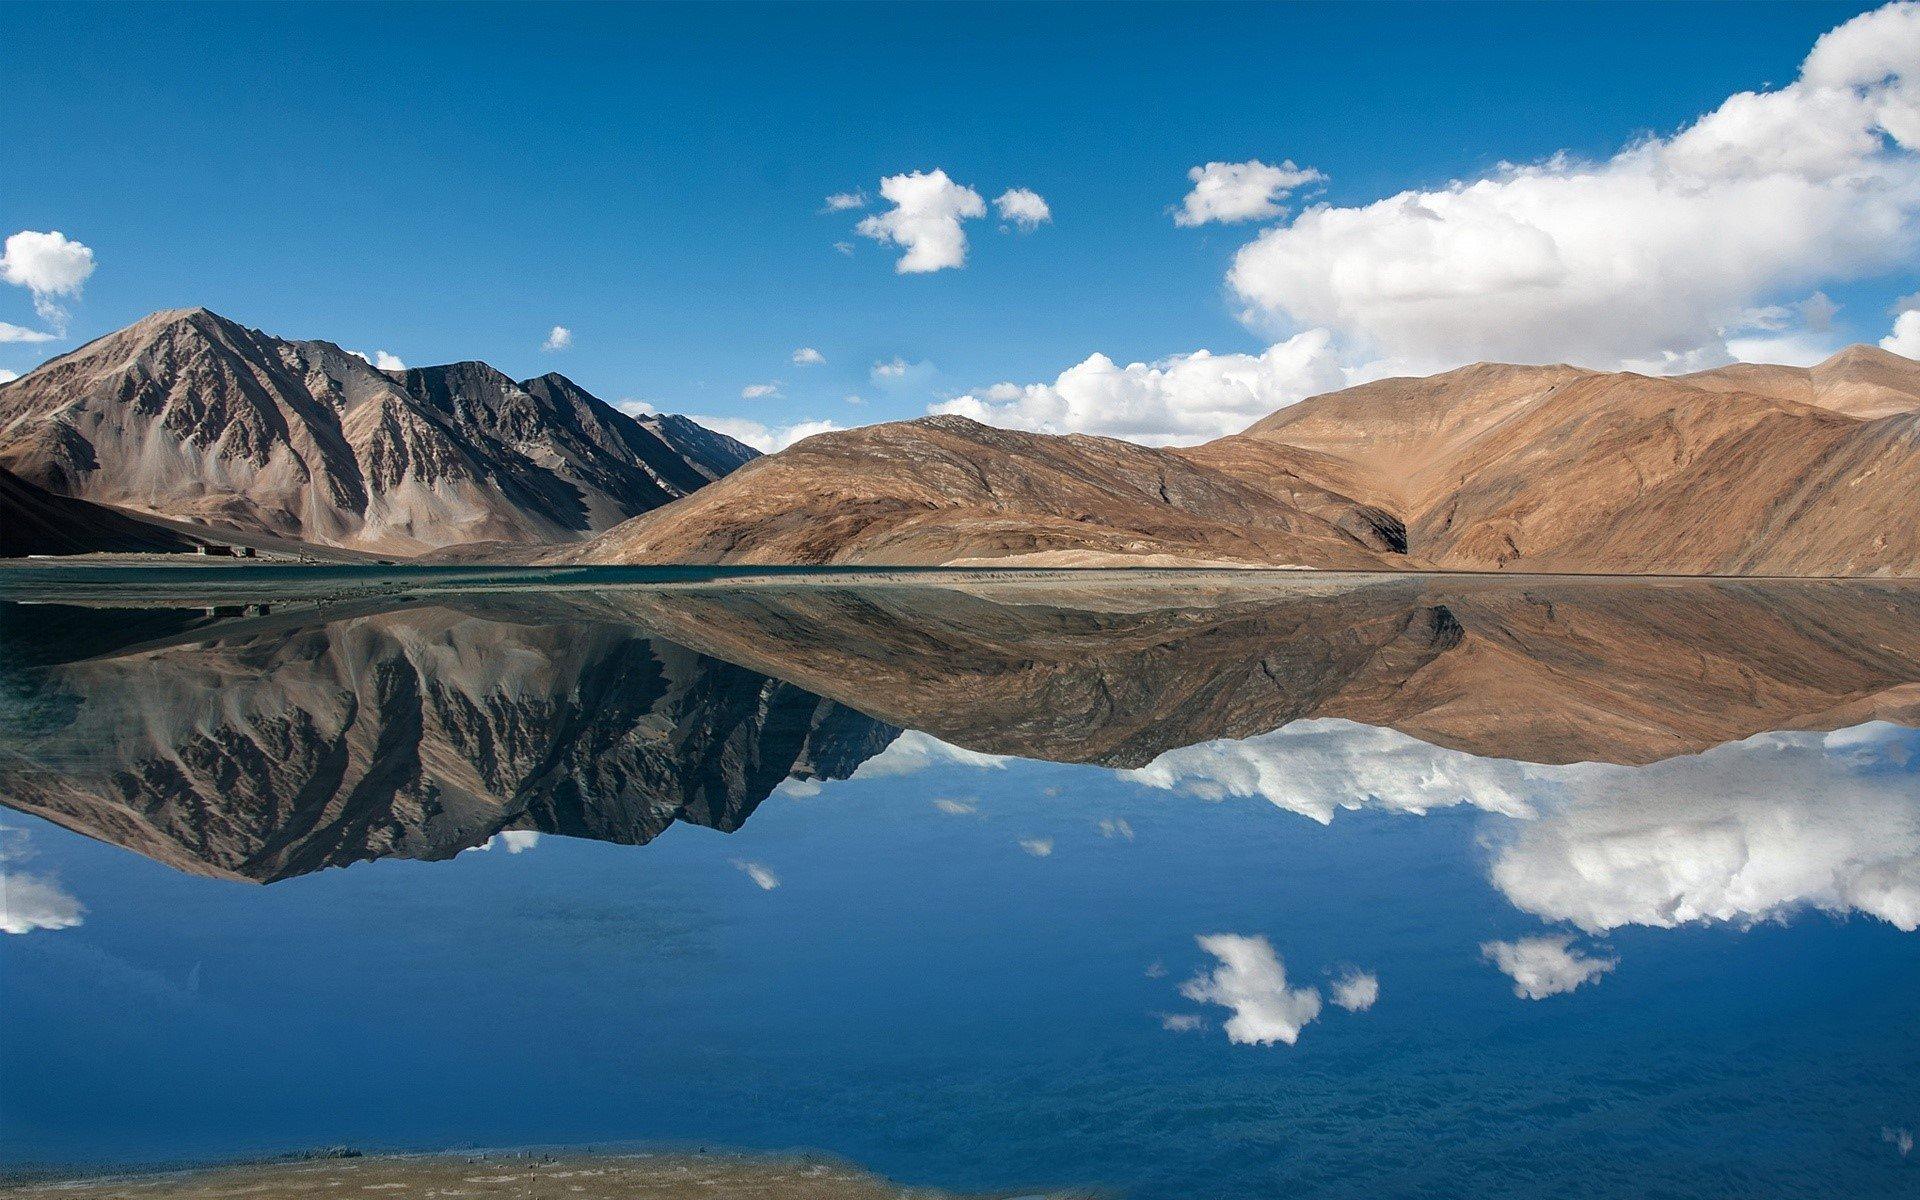 Fondo de pantalla de Lago Pangong en Jammu y Kashmir Imágenes